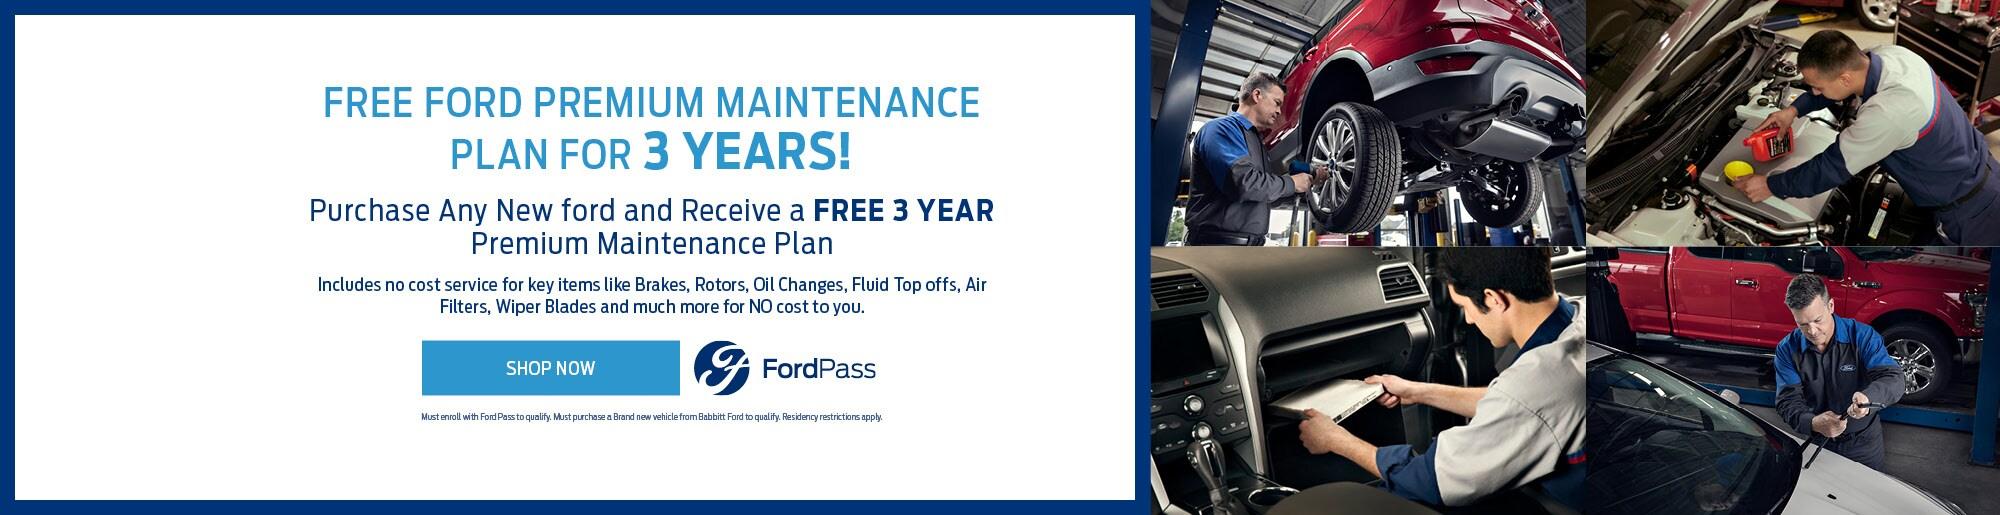 Flagstaff Car Dealers >> New 2018 2019 Ford Used Car Dealer Flagstaff Az Near Sedona Az